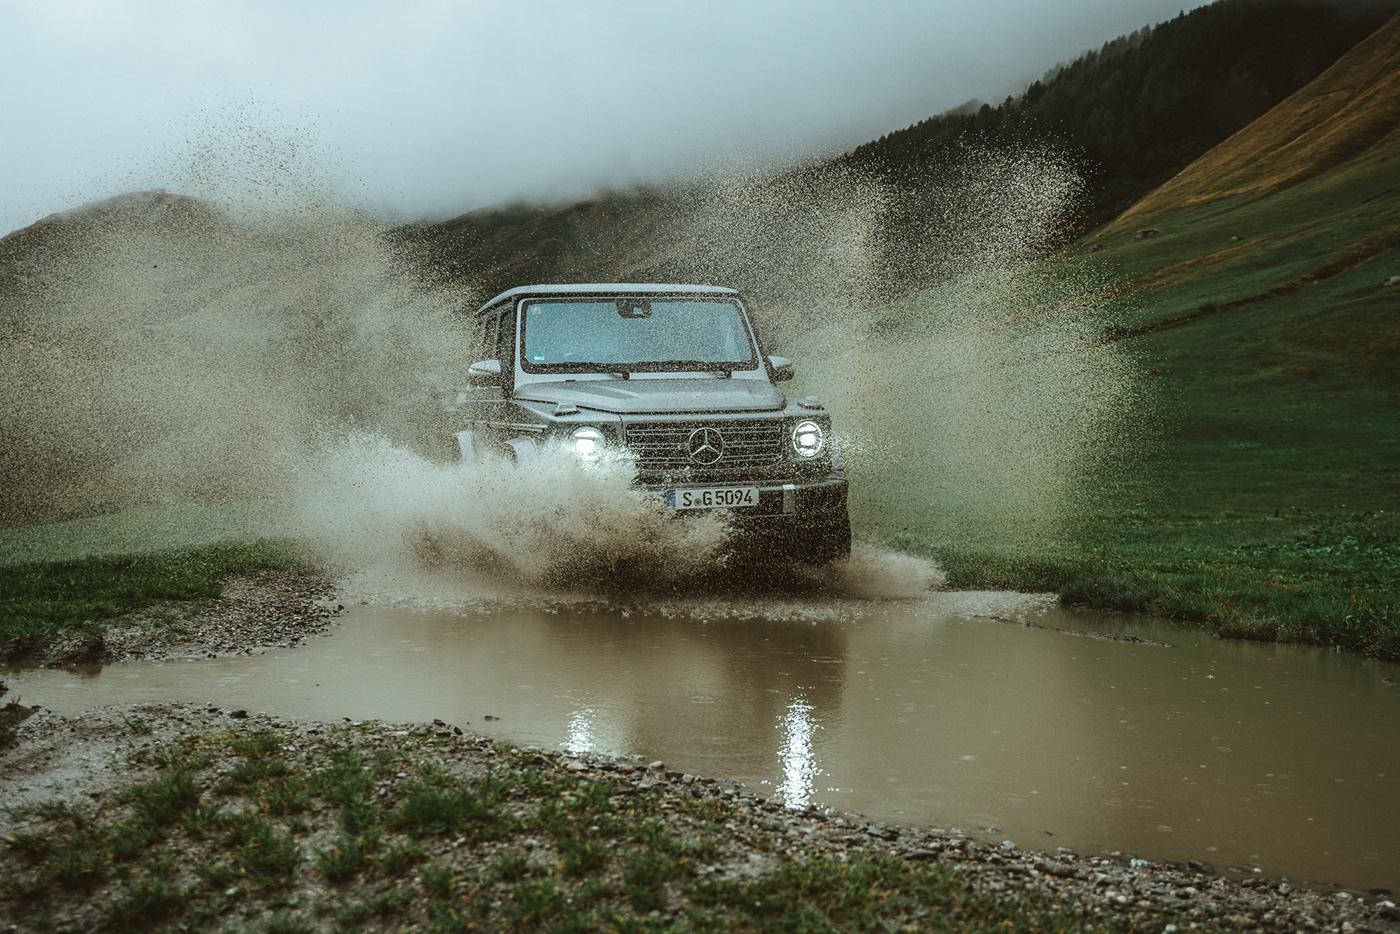 4WD,4x4,car,car photography,g class,G Wagon,mercedes,Mercedes Benz,Offroad,Switzerland